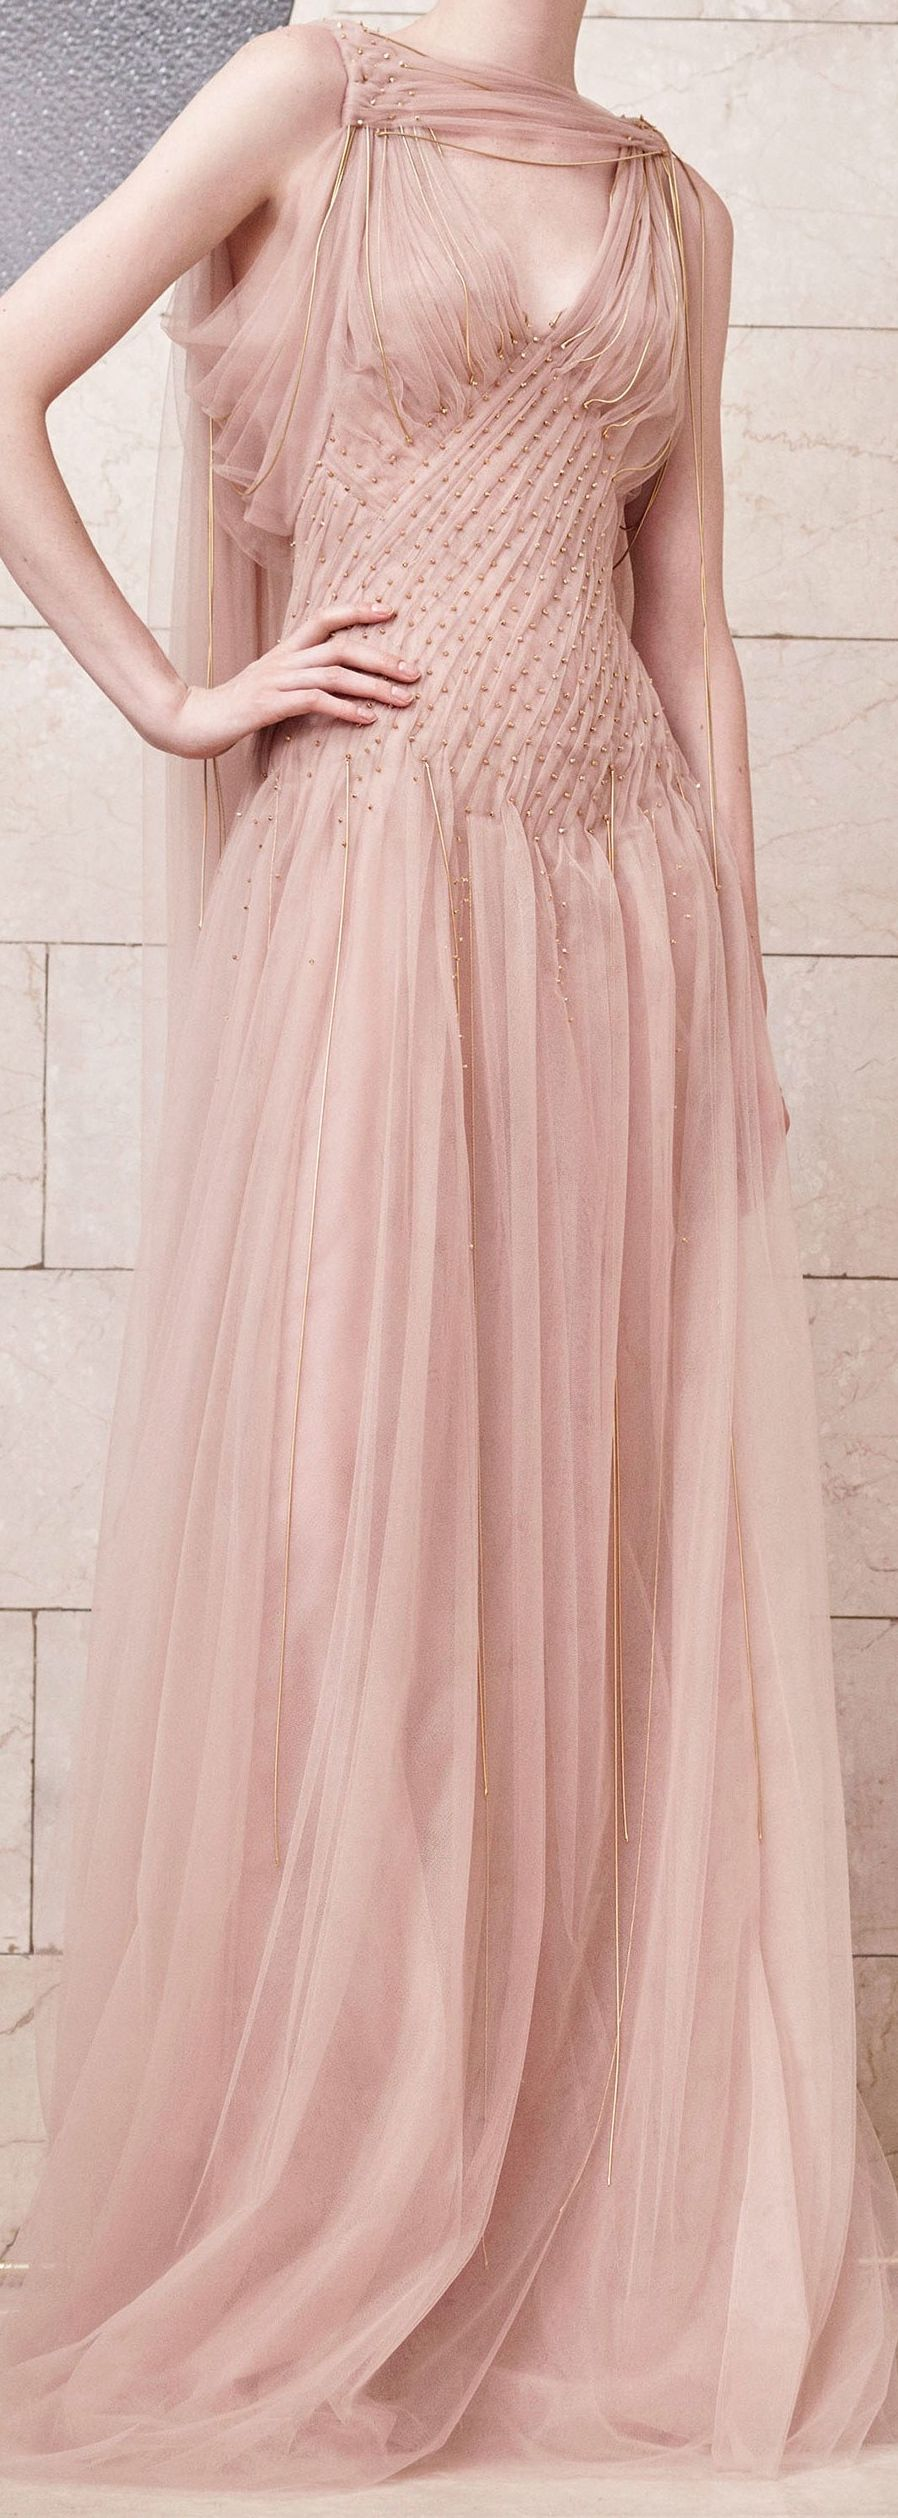 Versace wedding dress  Atelier Versace Fall  Couture  Fashion  Drape  Pattern